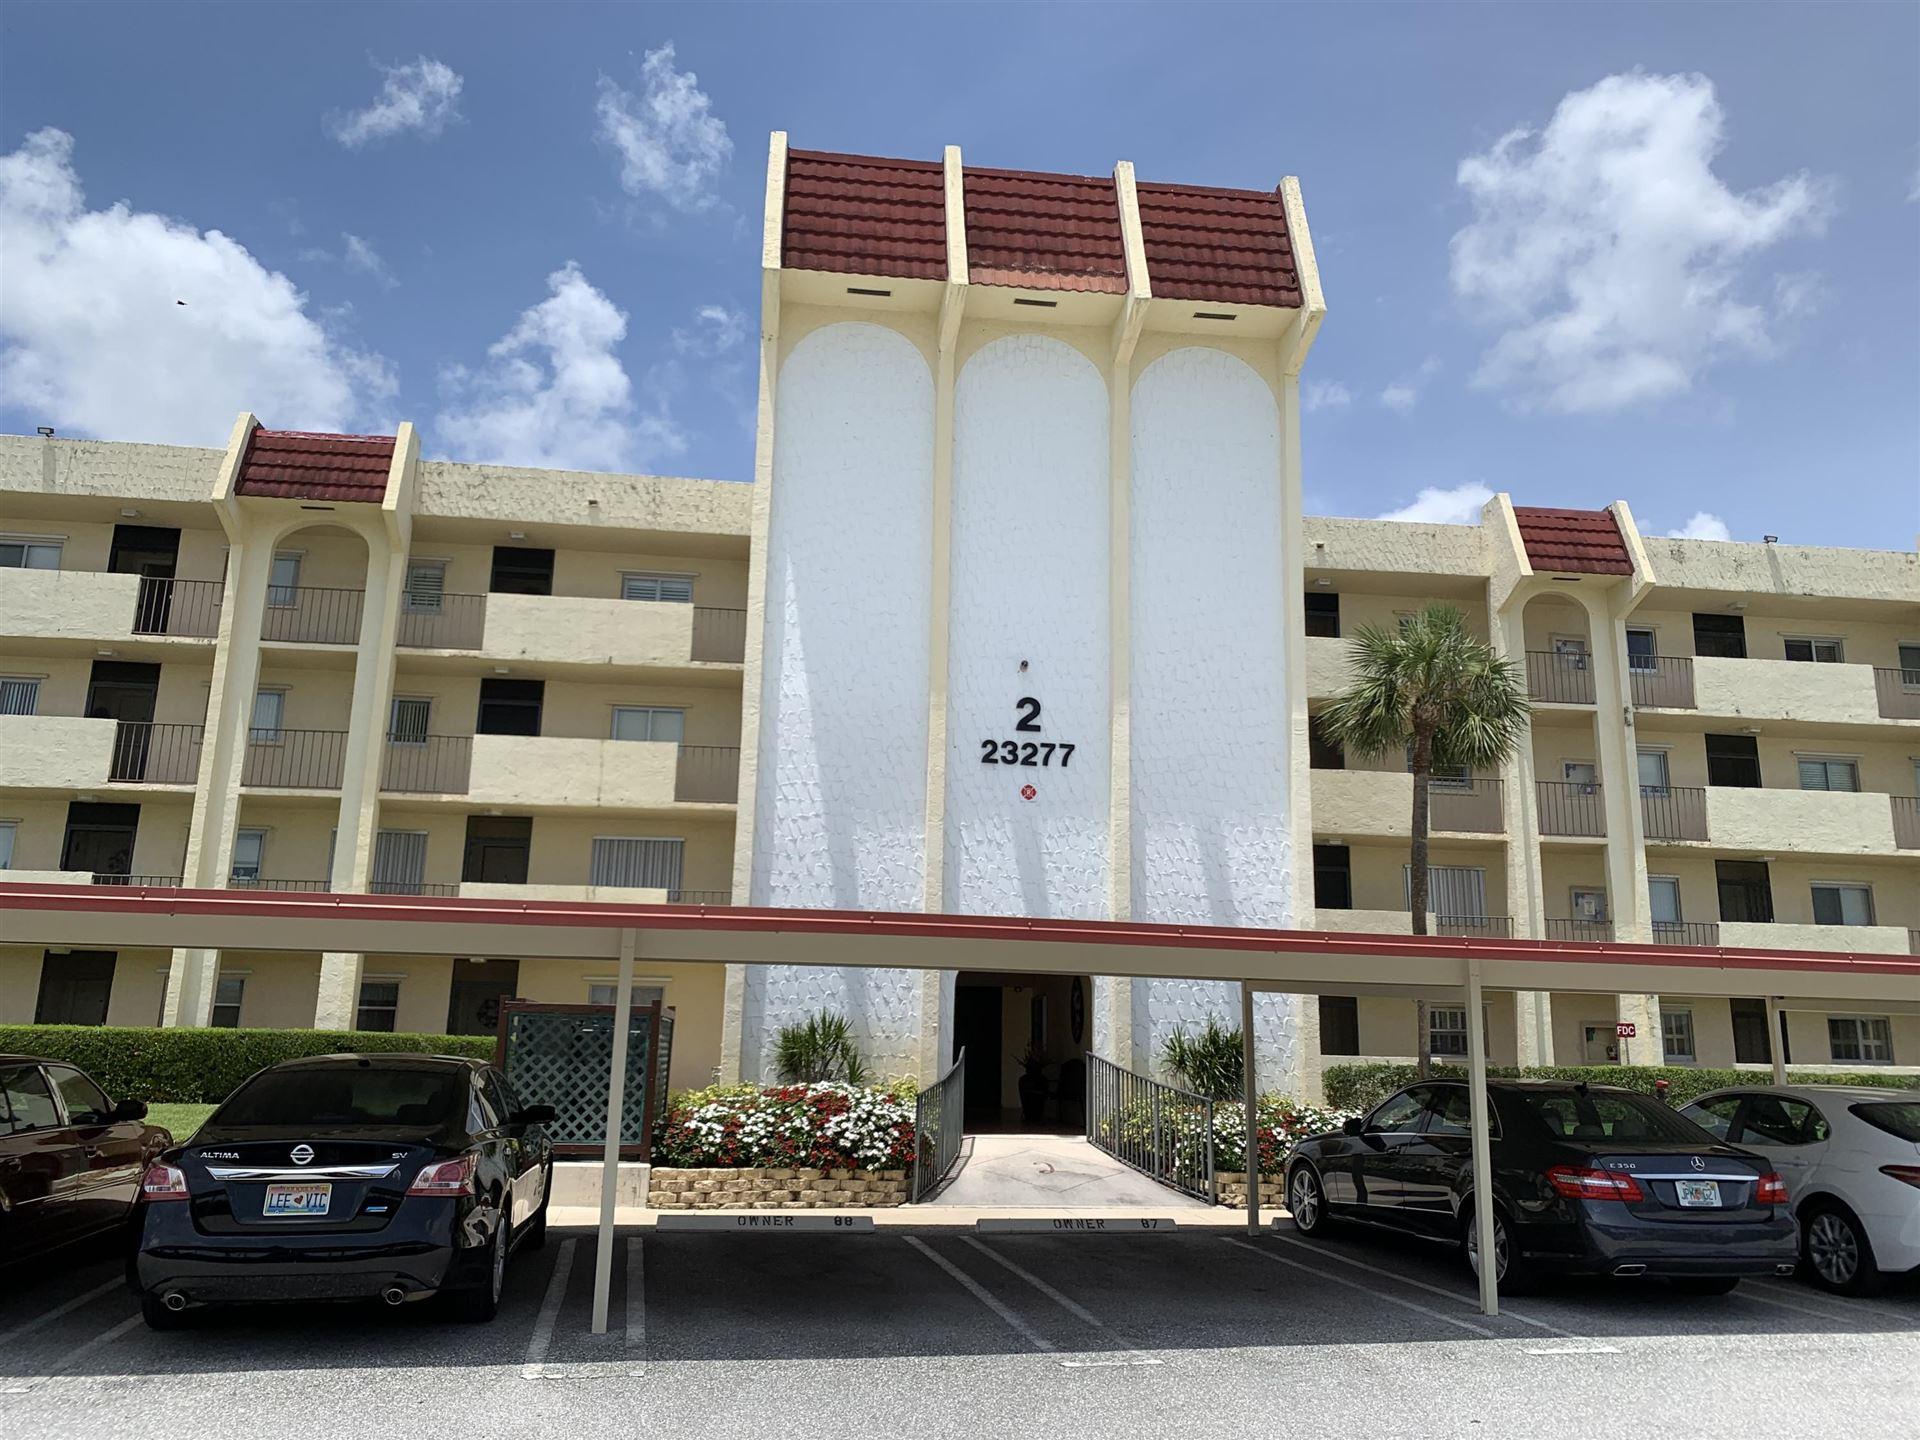 23277 Barwood Lane N #306, Boca Raton, FL 33428 - MLS#: RX-10712510